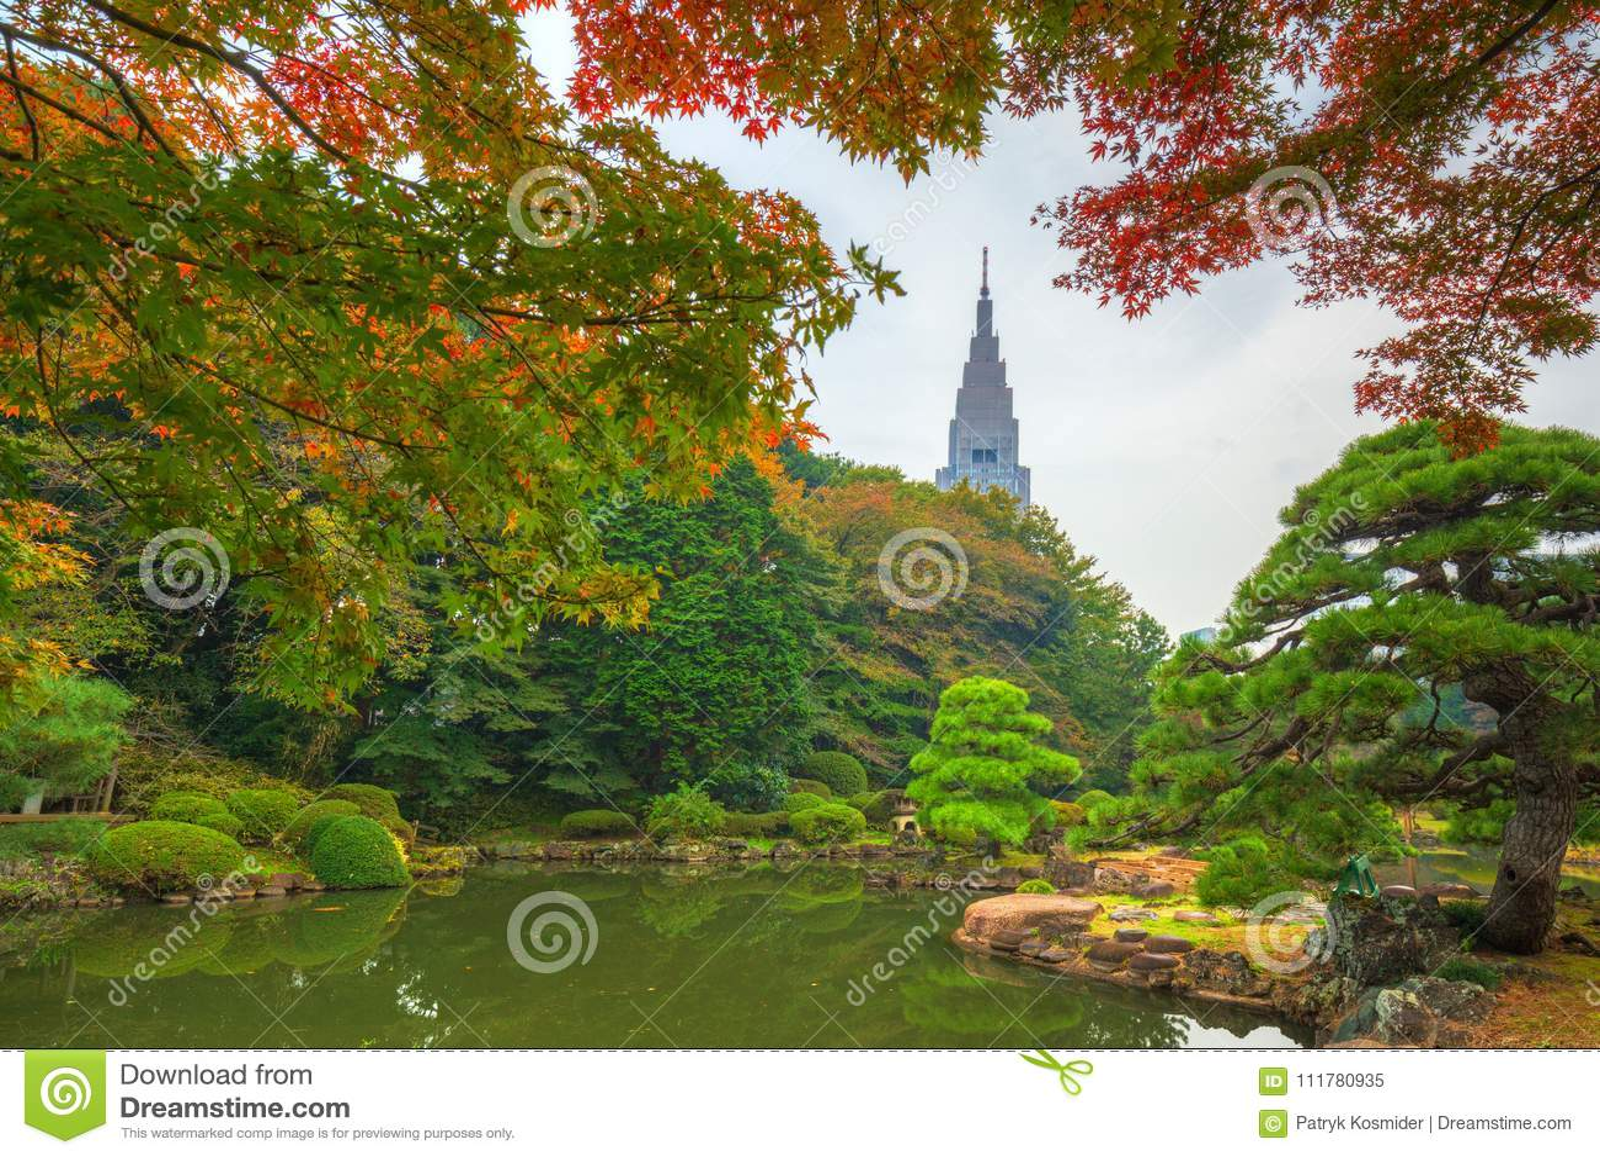 Autumn in the Shinjuku Park, Tokyo